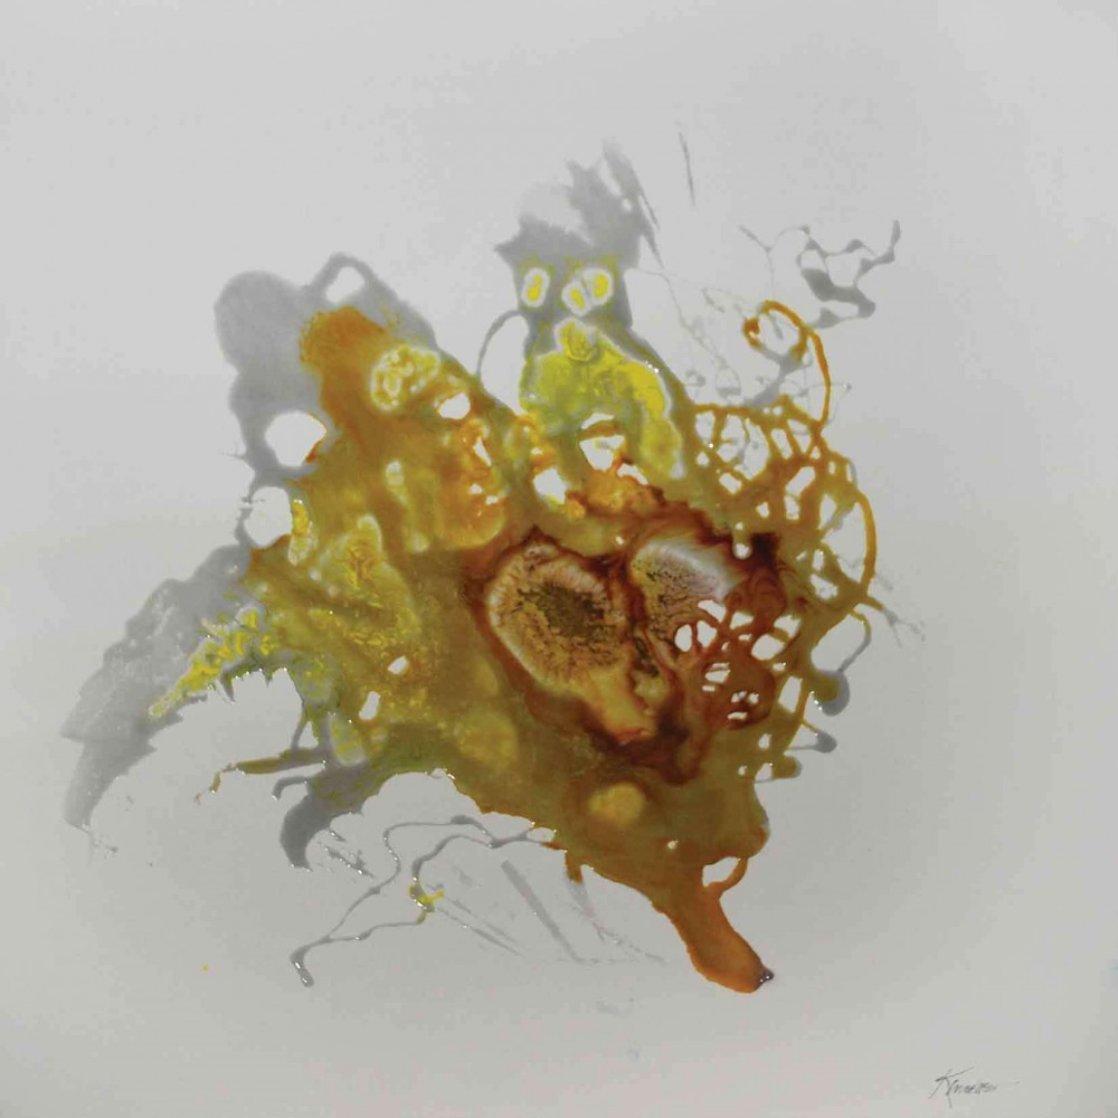 Persephone 2016 24x24 Original Painting by Joseph Kinnebrew